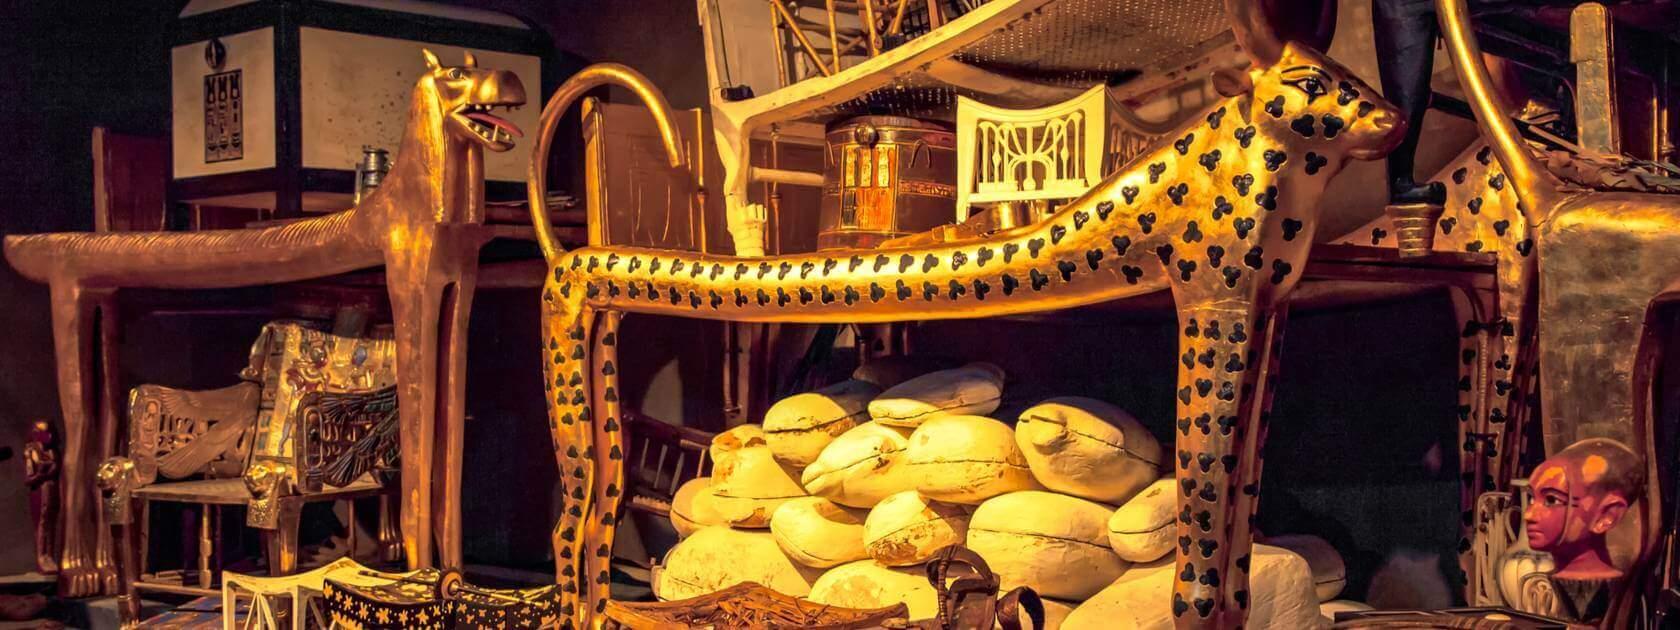 Legendary Treasures King Tut Tomb